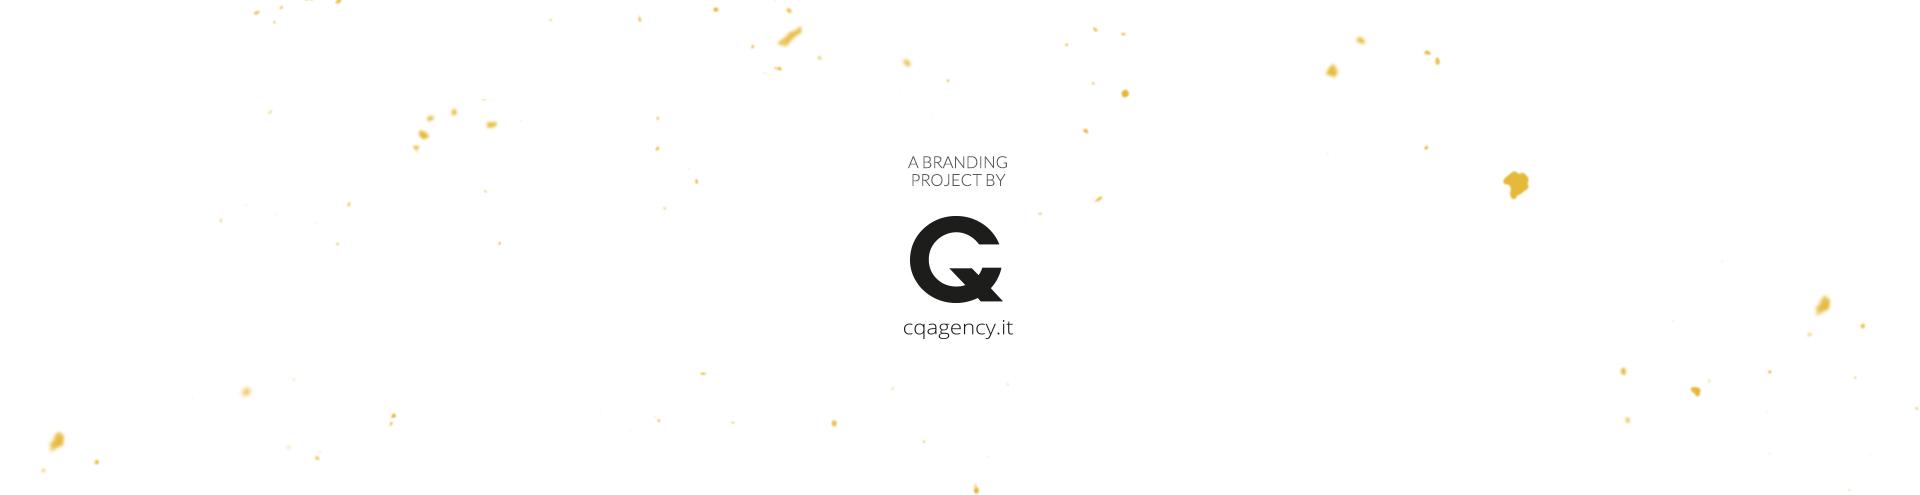 Barbara Manto - CQ Agency